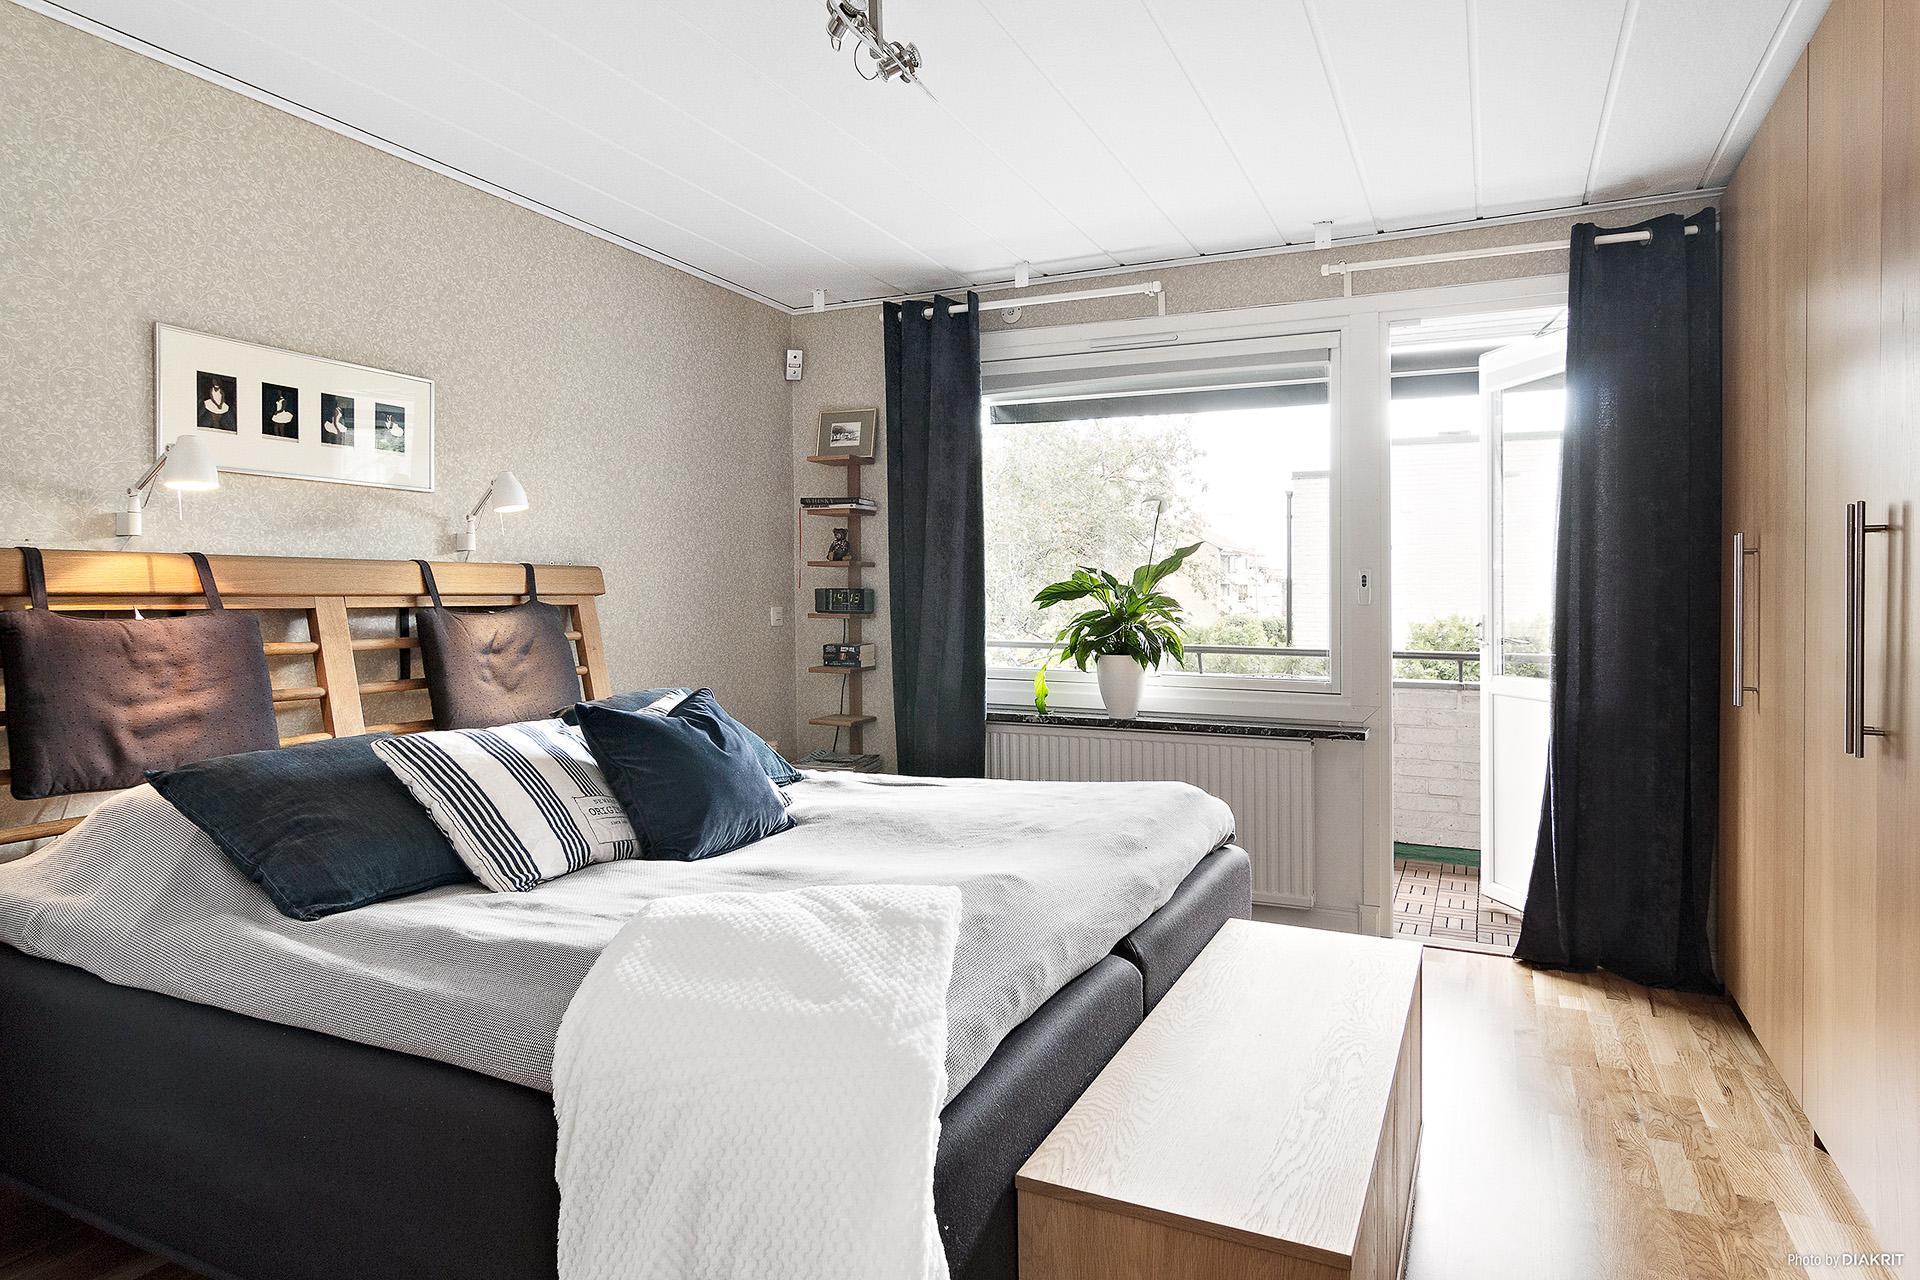 Stort sovrum med utgång till balkongen